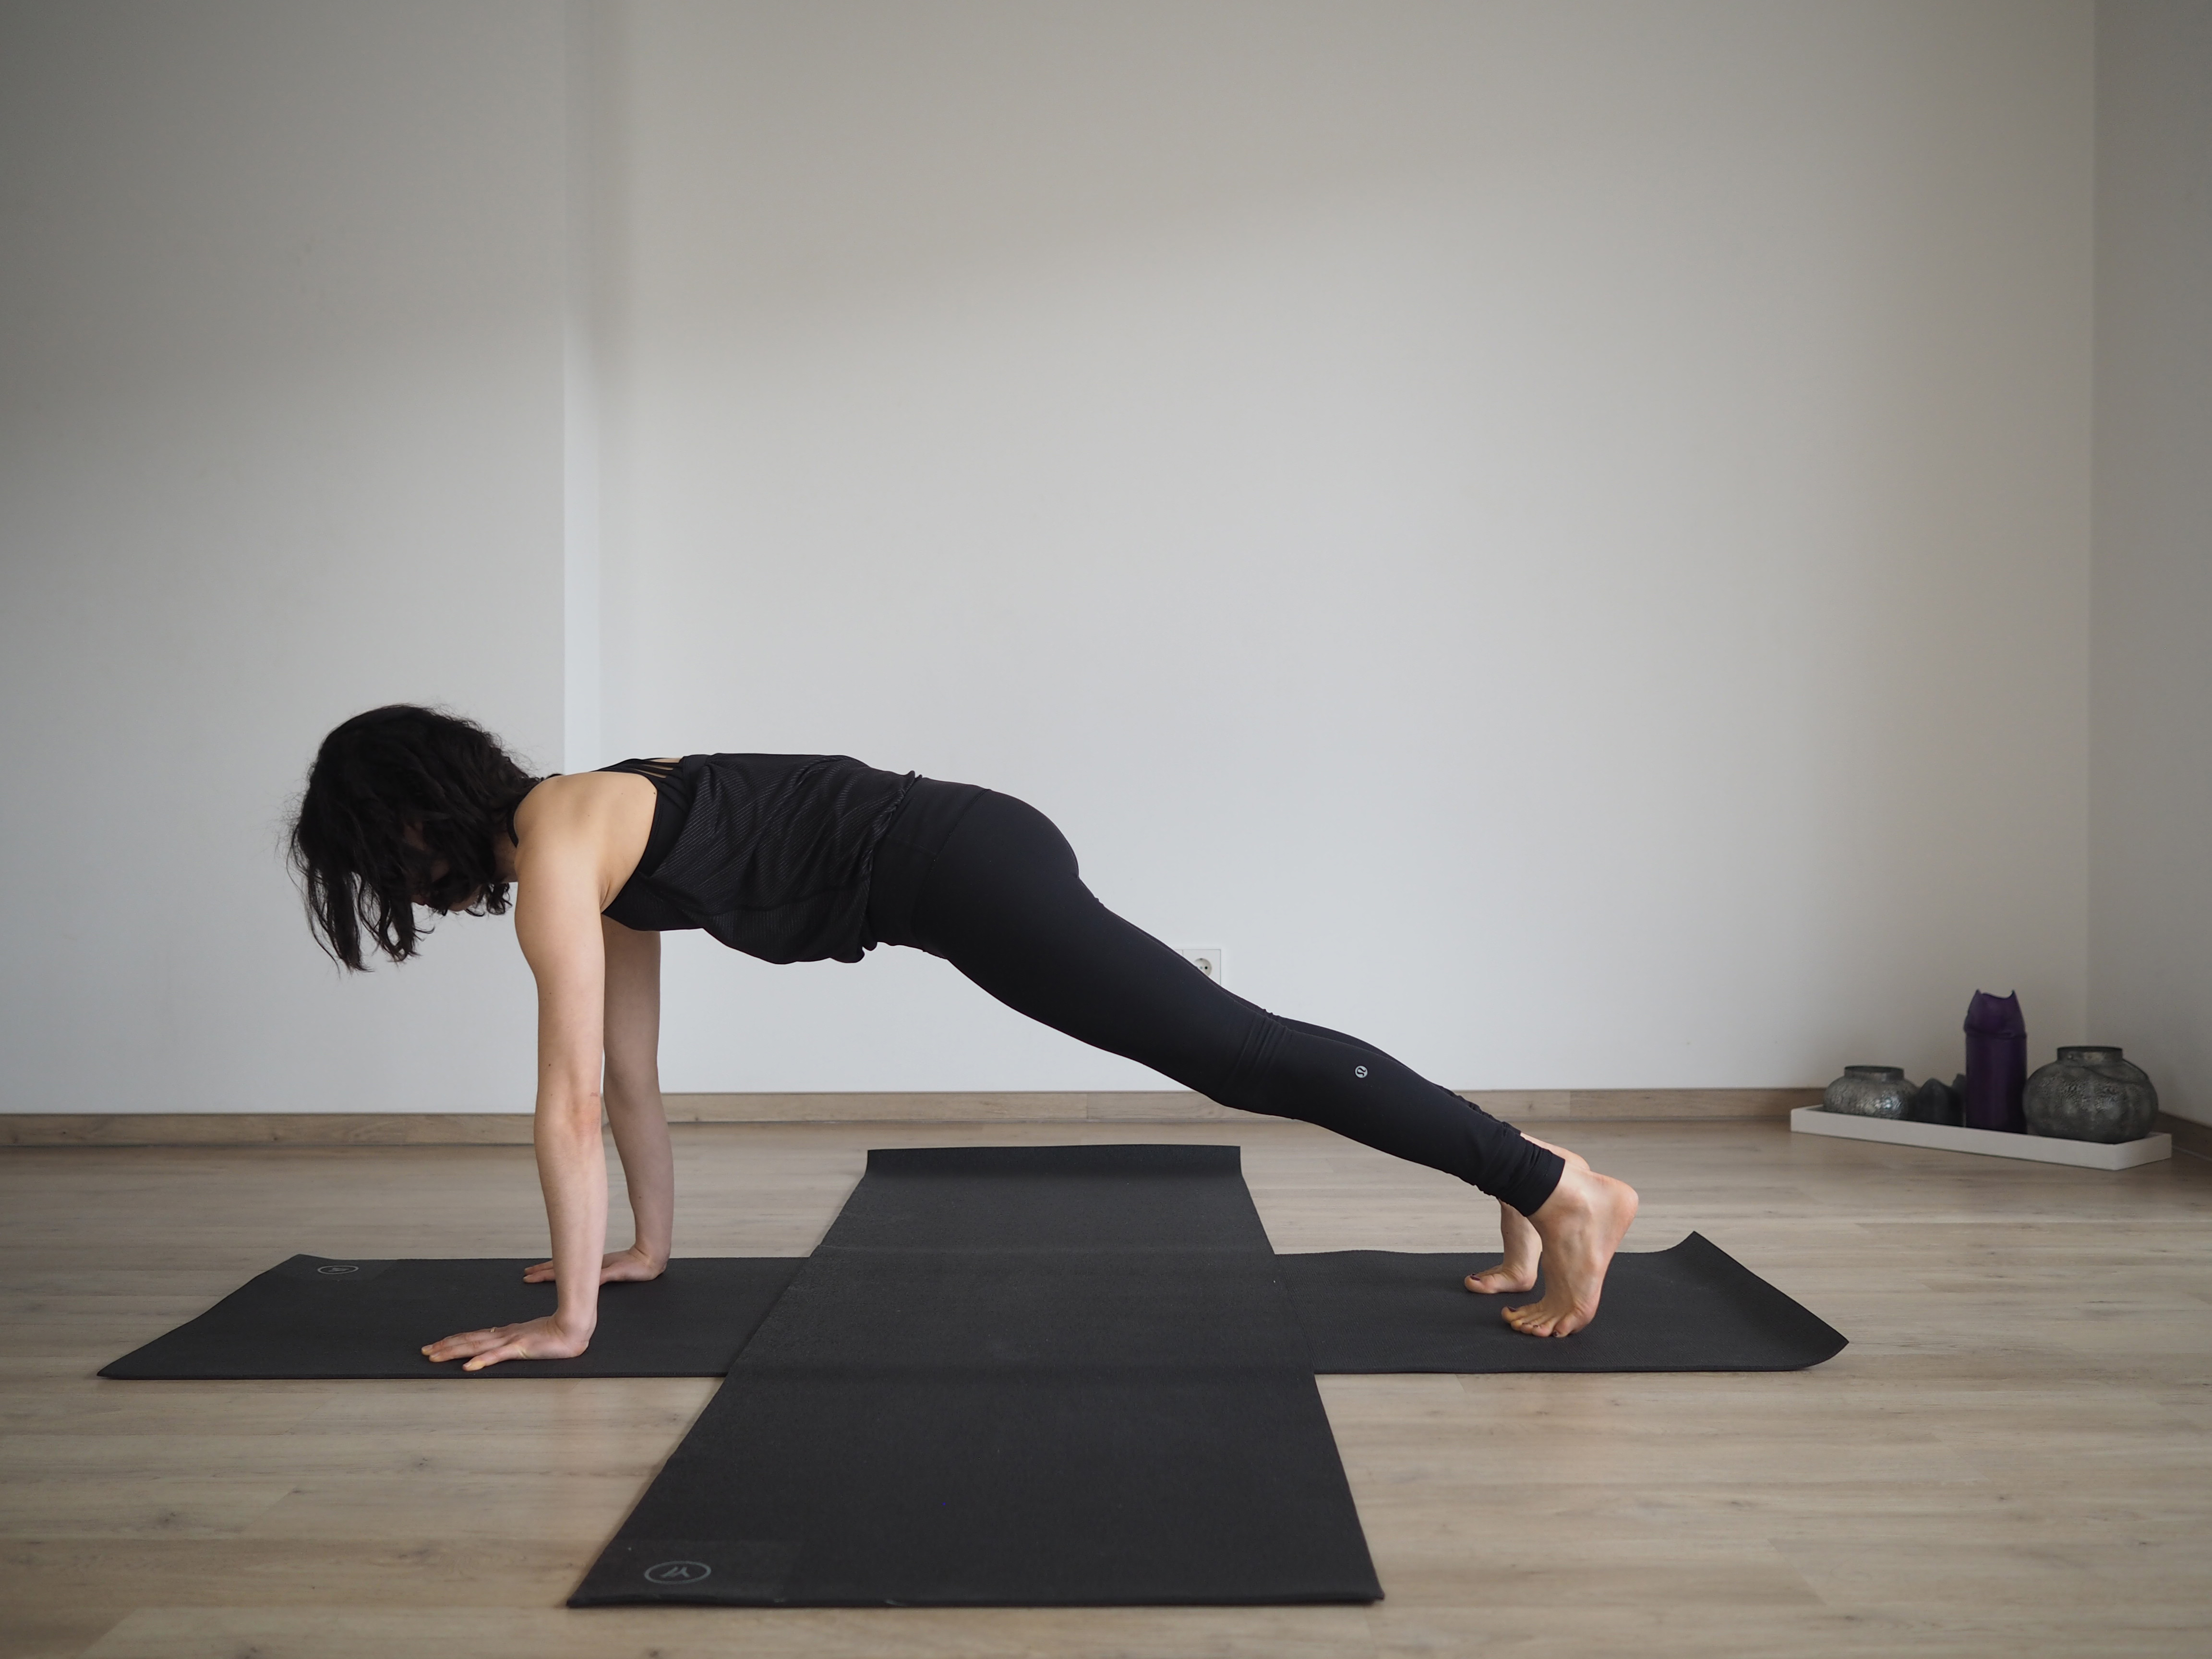 yoga bungen f r den bauch deinfitnesscoach. Black Bedroom Furniture Sets. Home Design Ideas